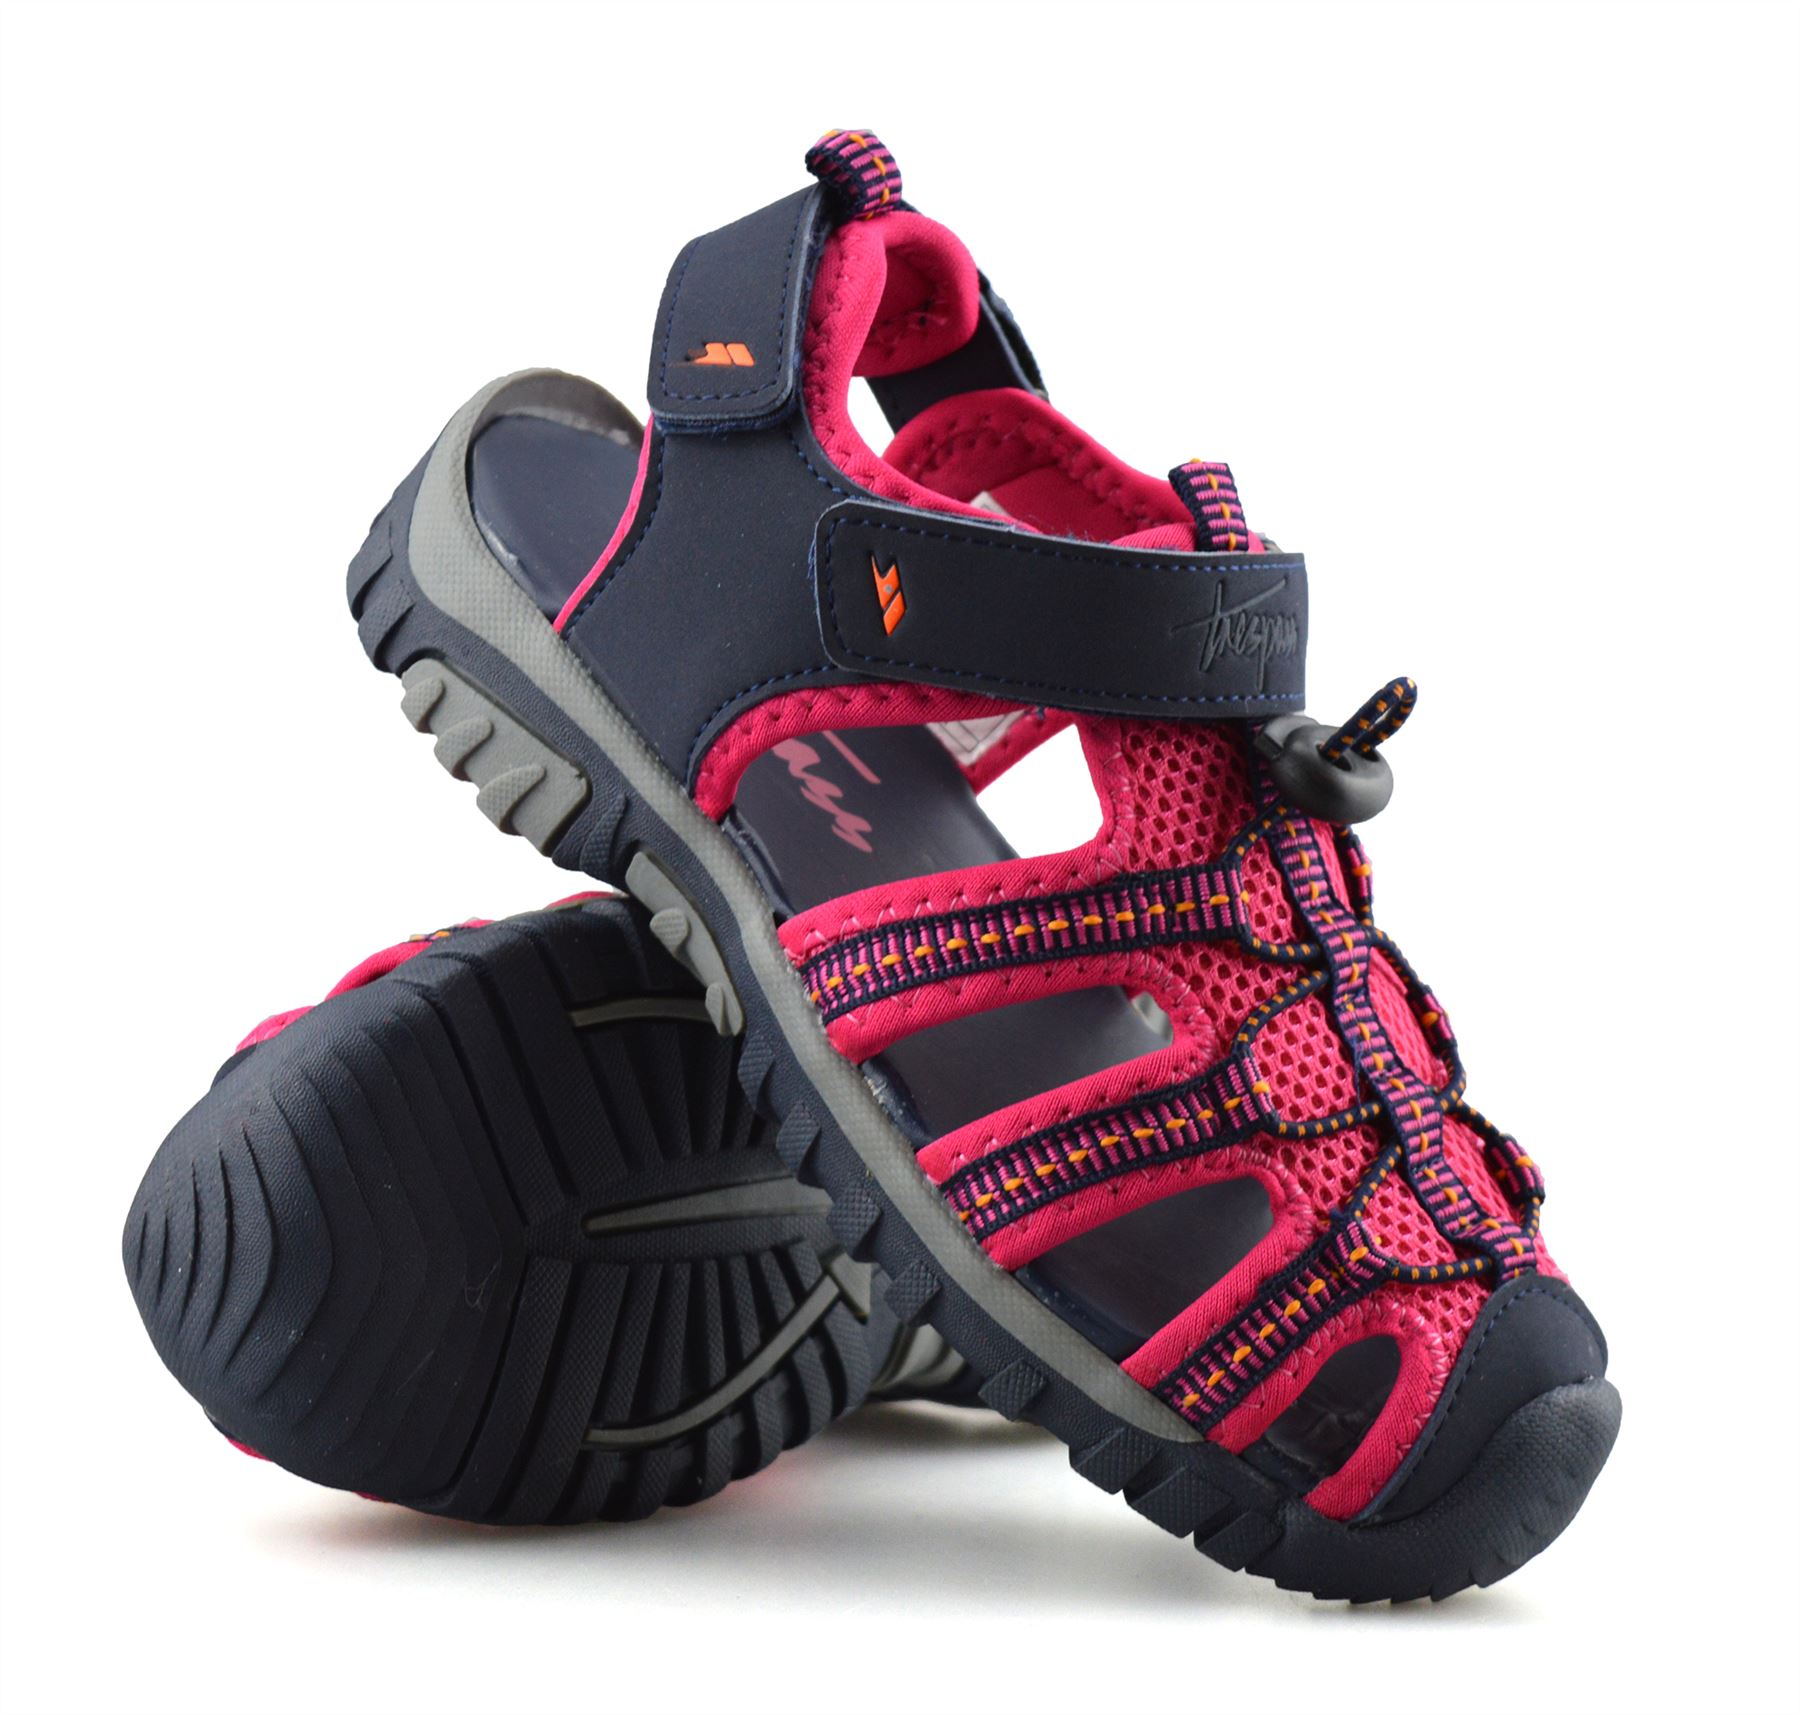 Boys-Girls-Kids-Trespass-Summer-Beach-Casual-Walking-Sports-Sandals-Shoes-Size thumbnail 33